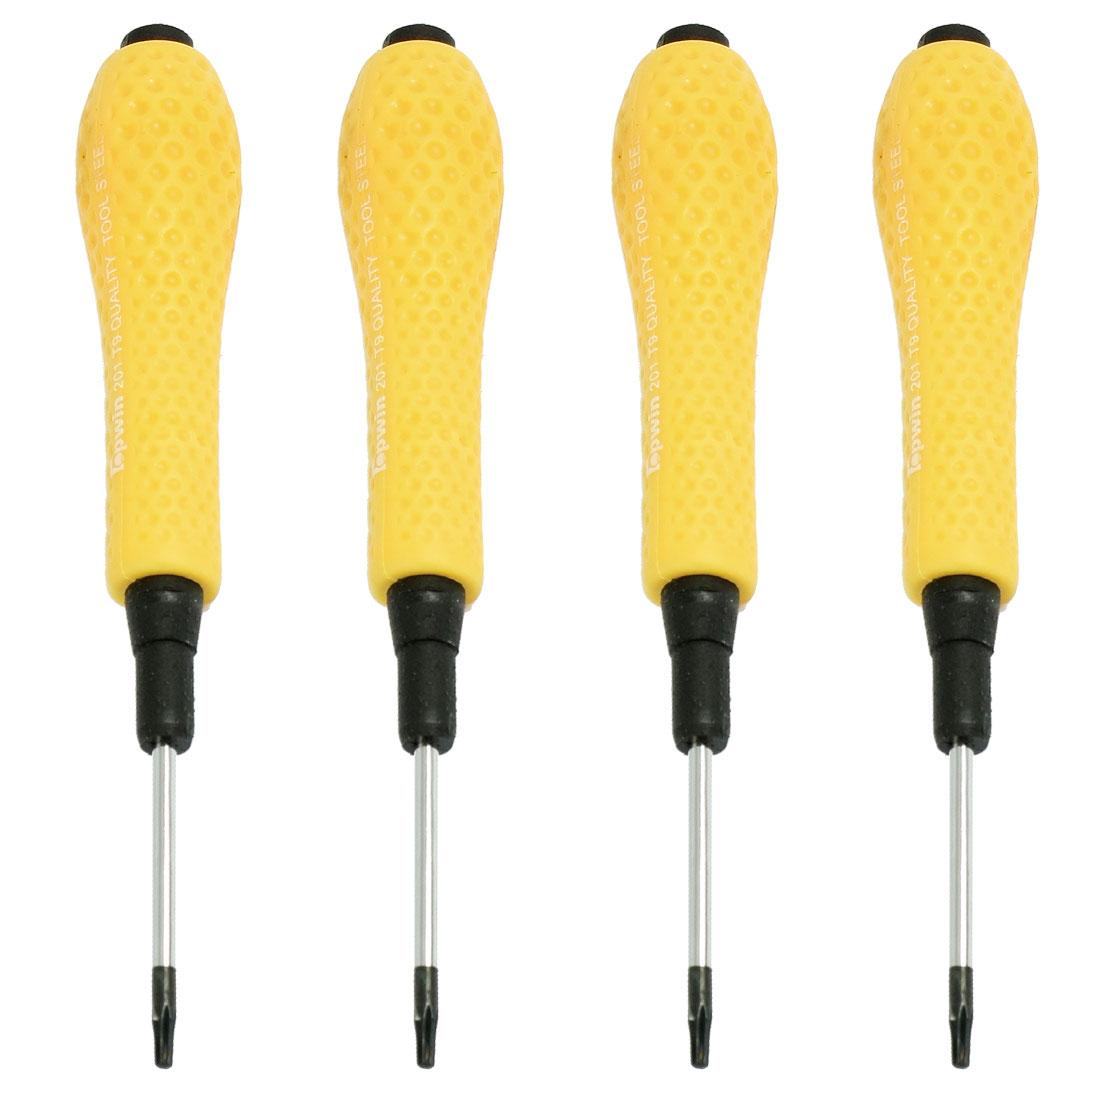 4 Pcs Yellow Plastic Handle T6 T8 T9 T10 Torx Screwdriver Bit